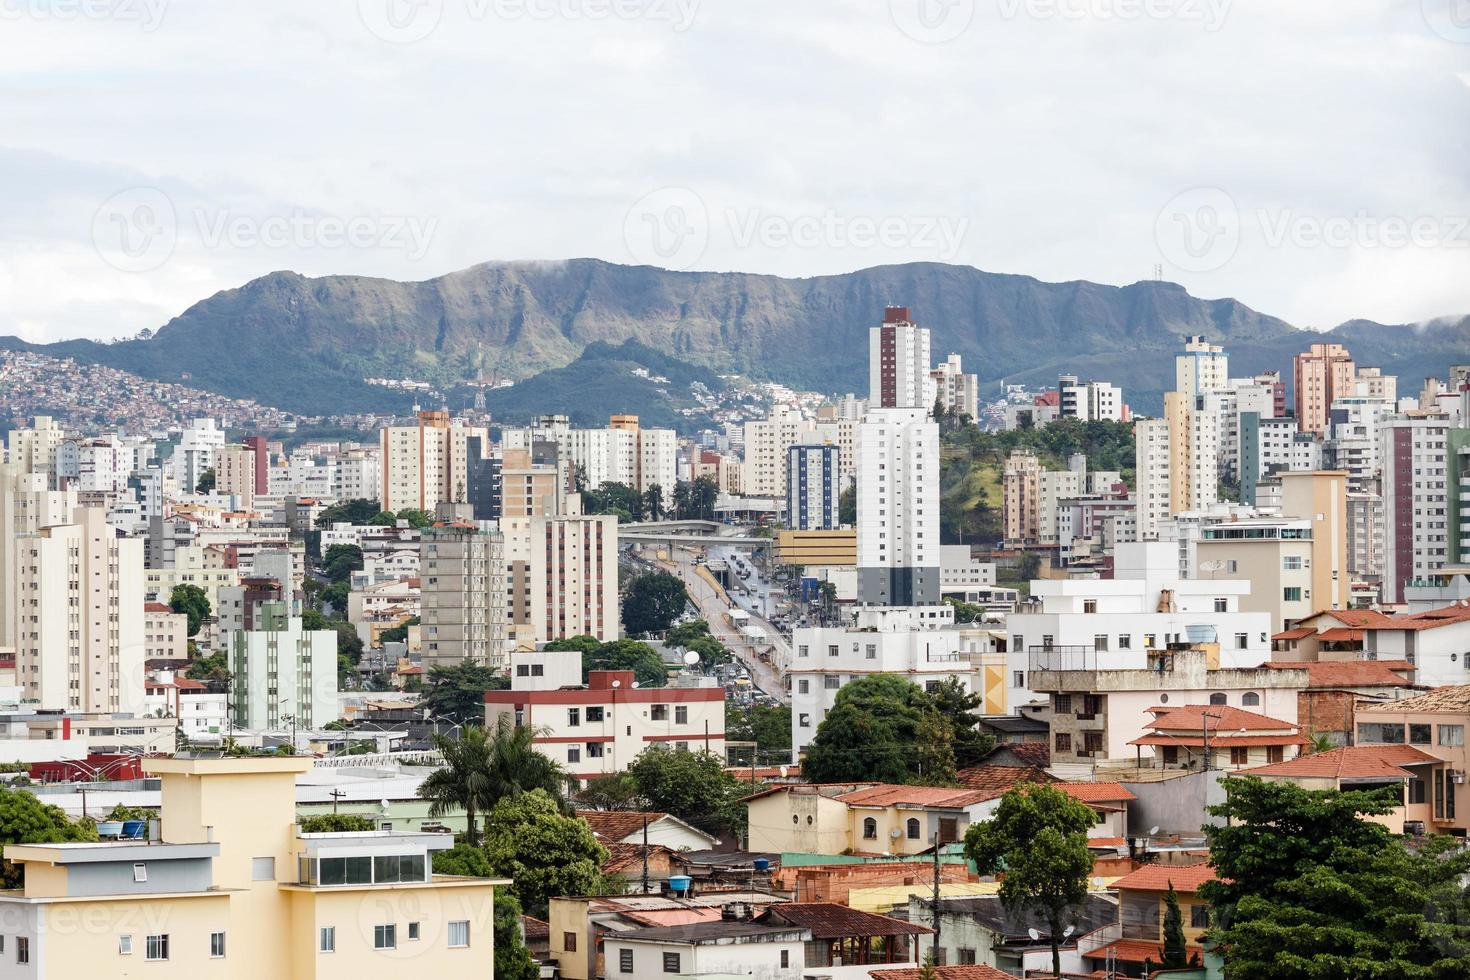 belo horizonte stad, minas gerais, brazilië foto